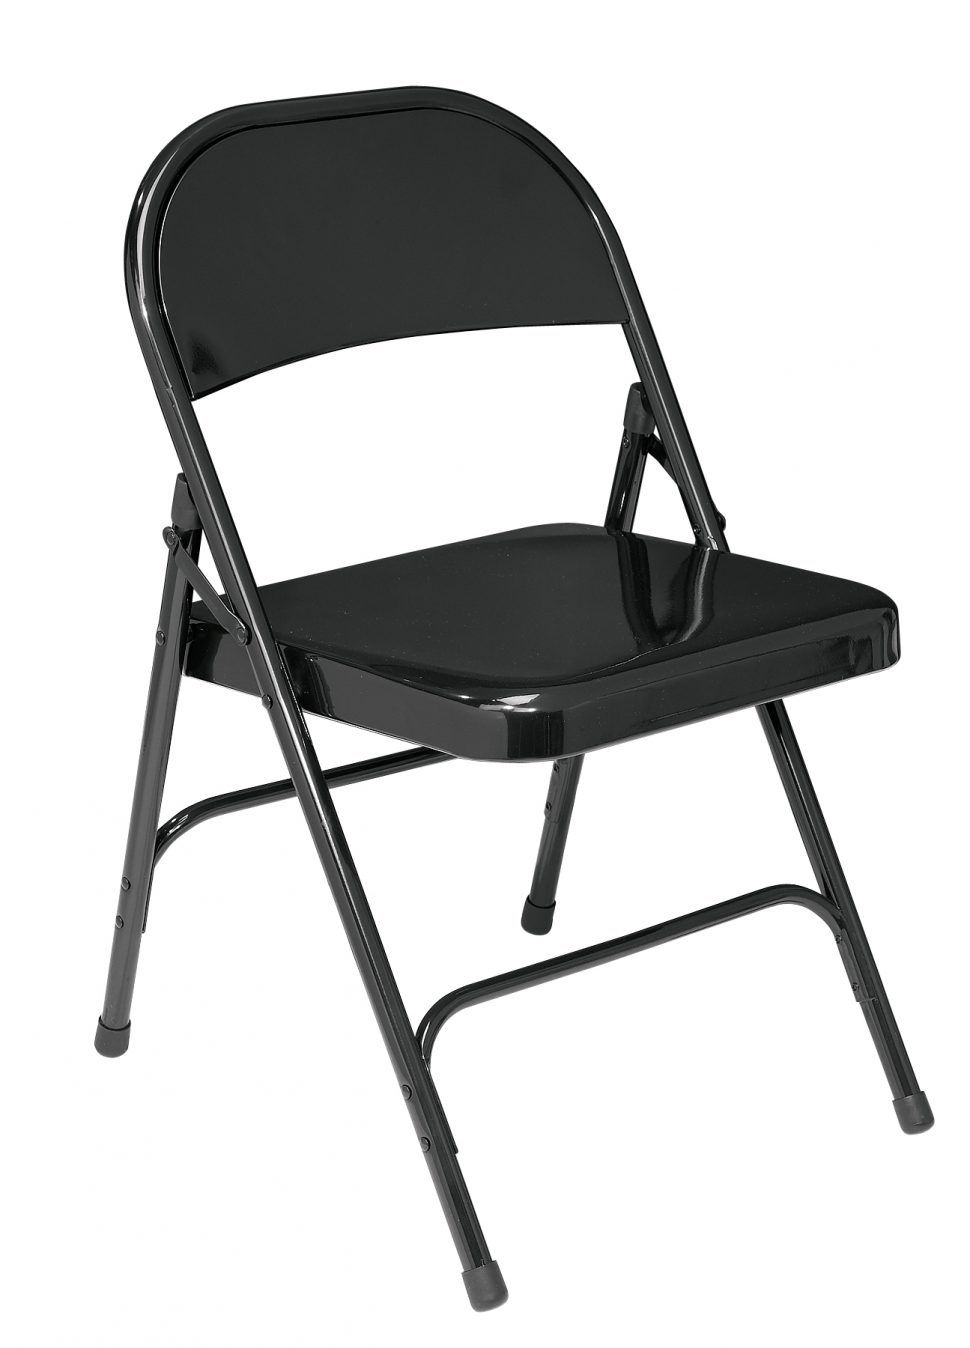 Heavy Duty Aluminum Folding Lawn Chair